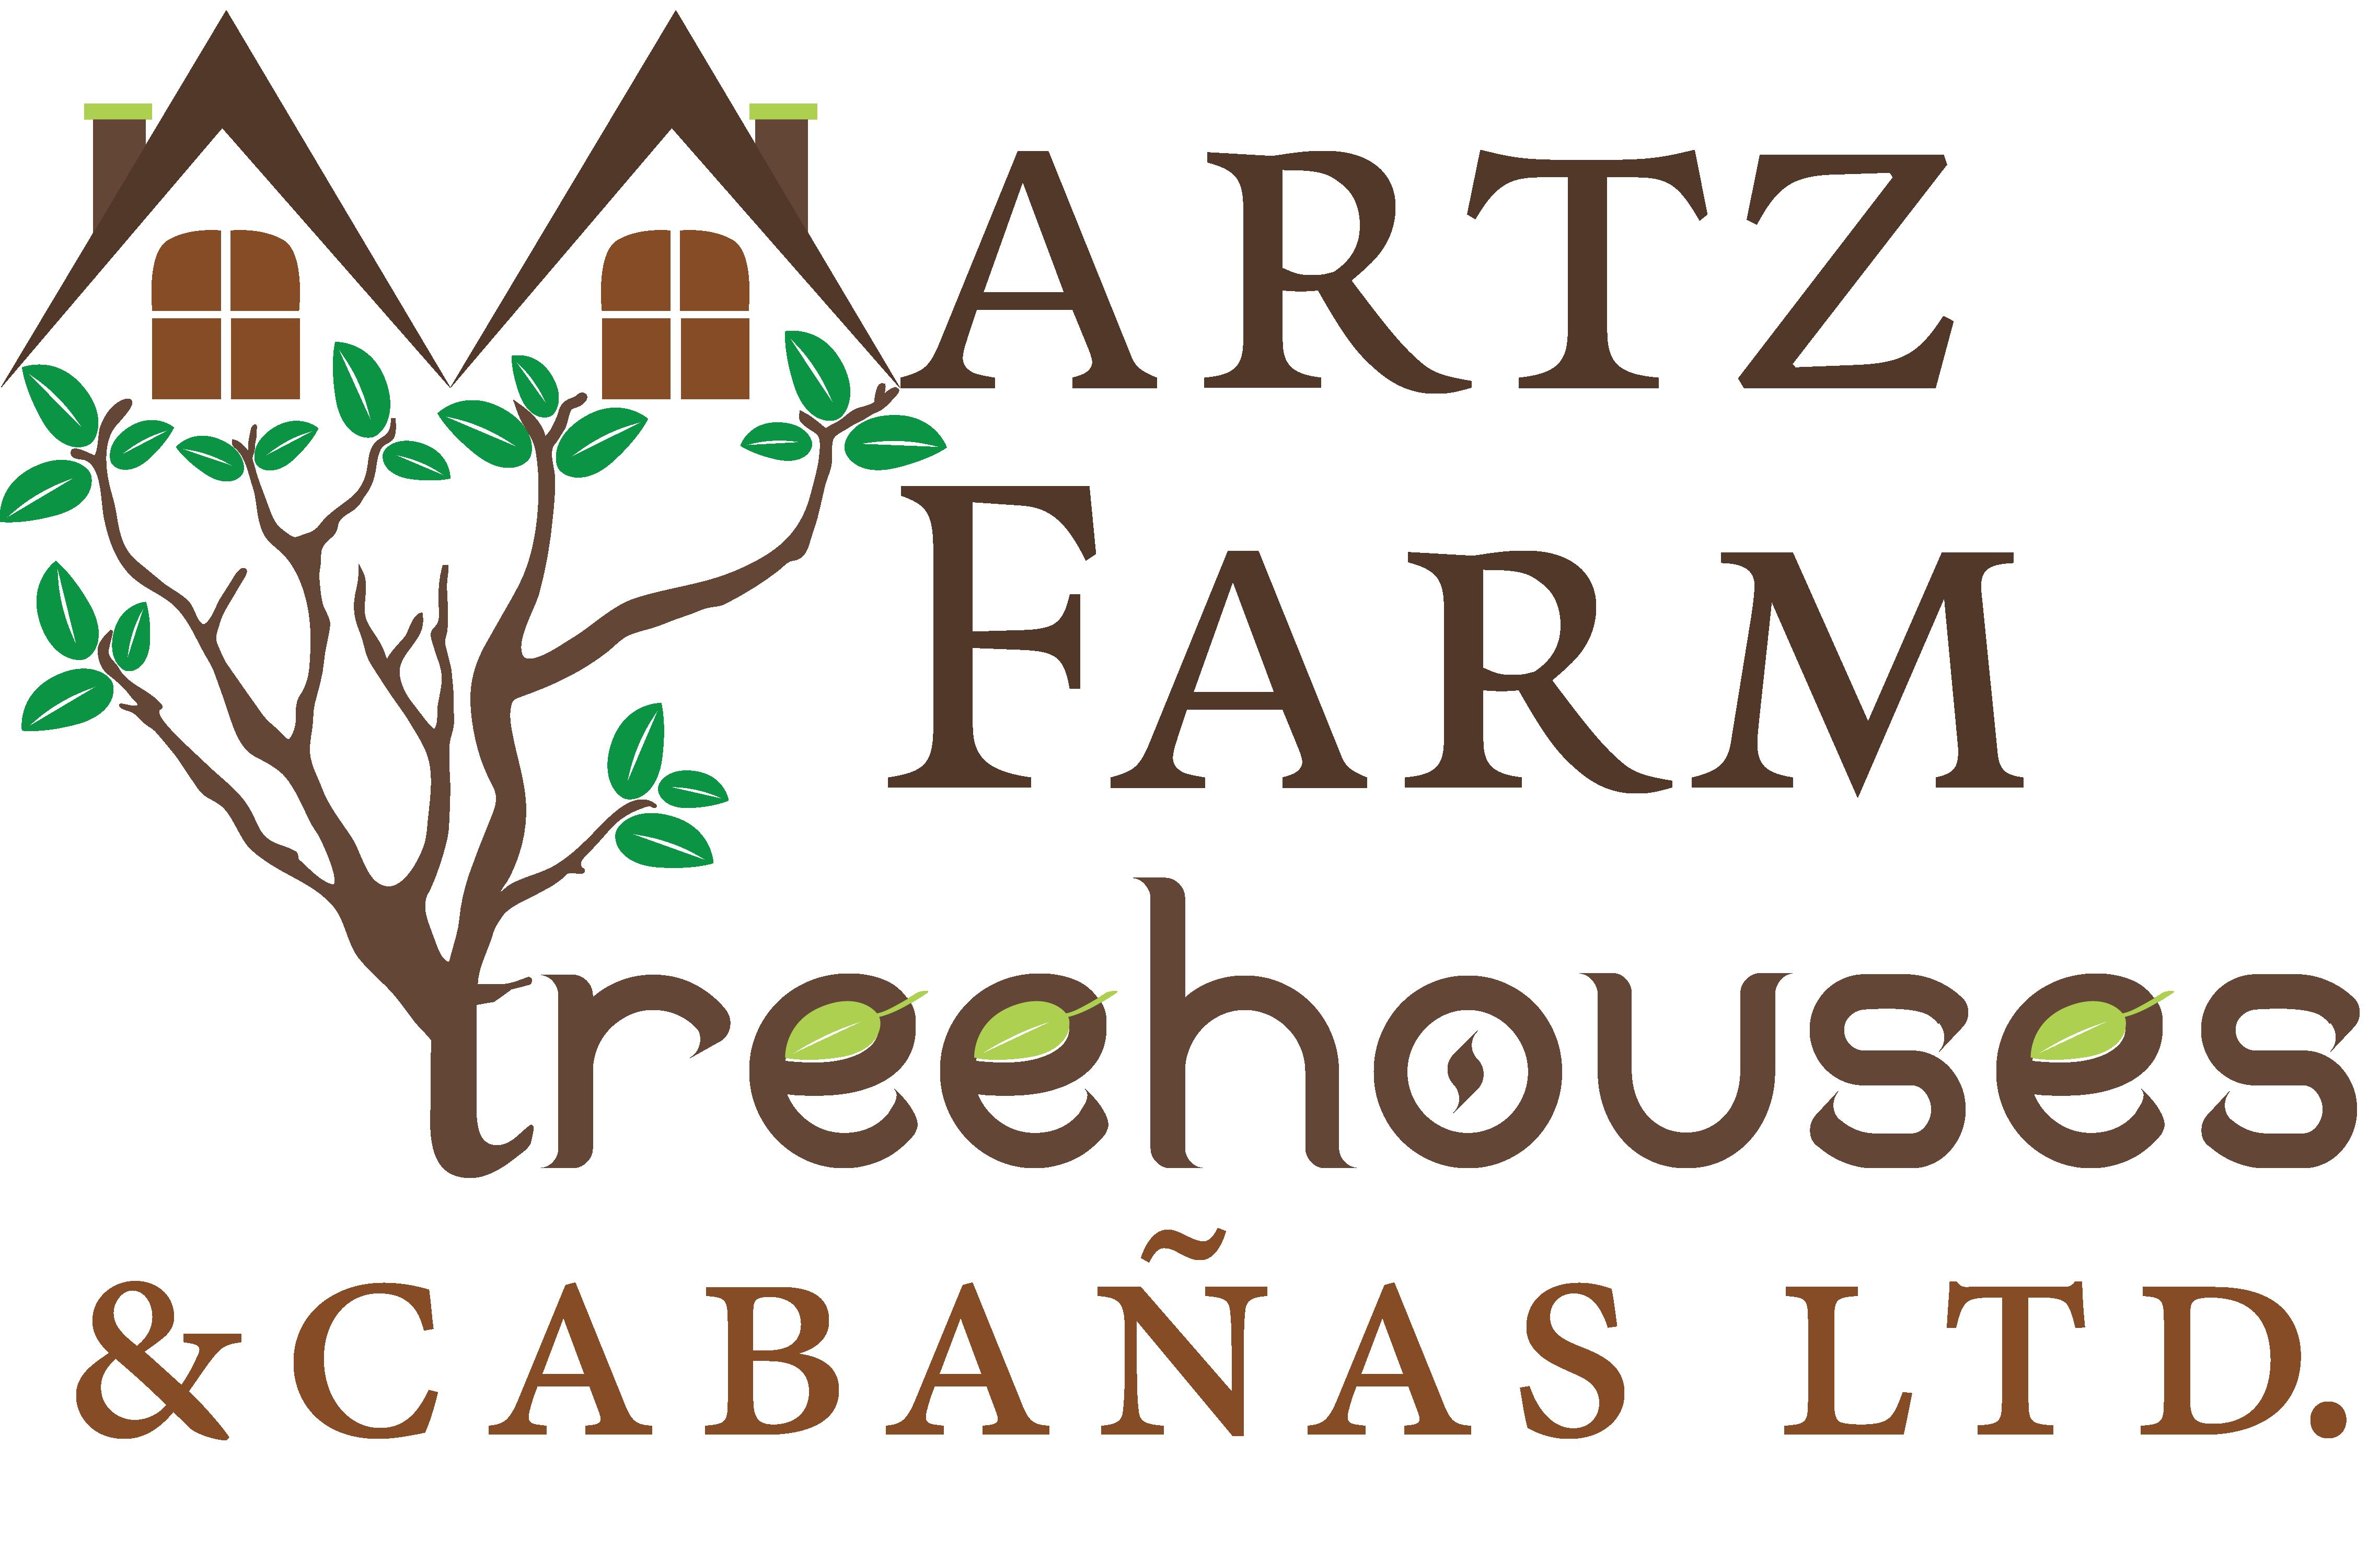 Martz Farm Treehouses & Cabanas Logo